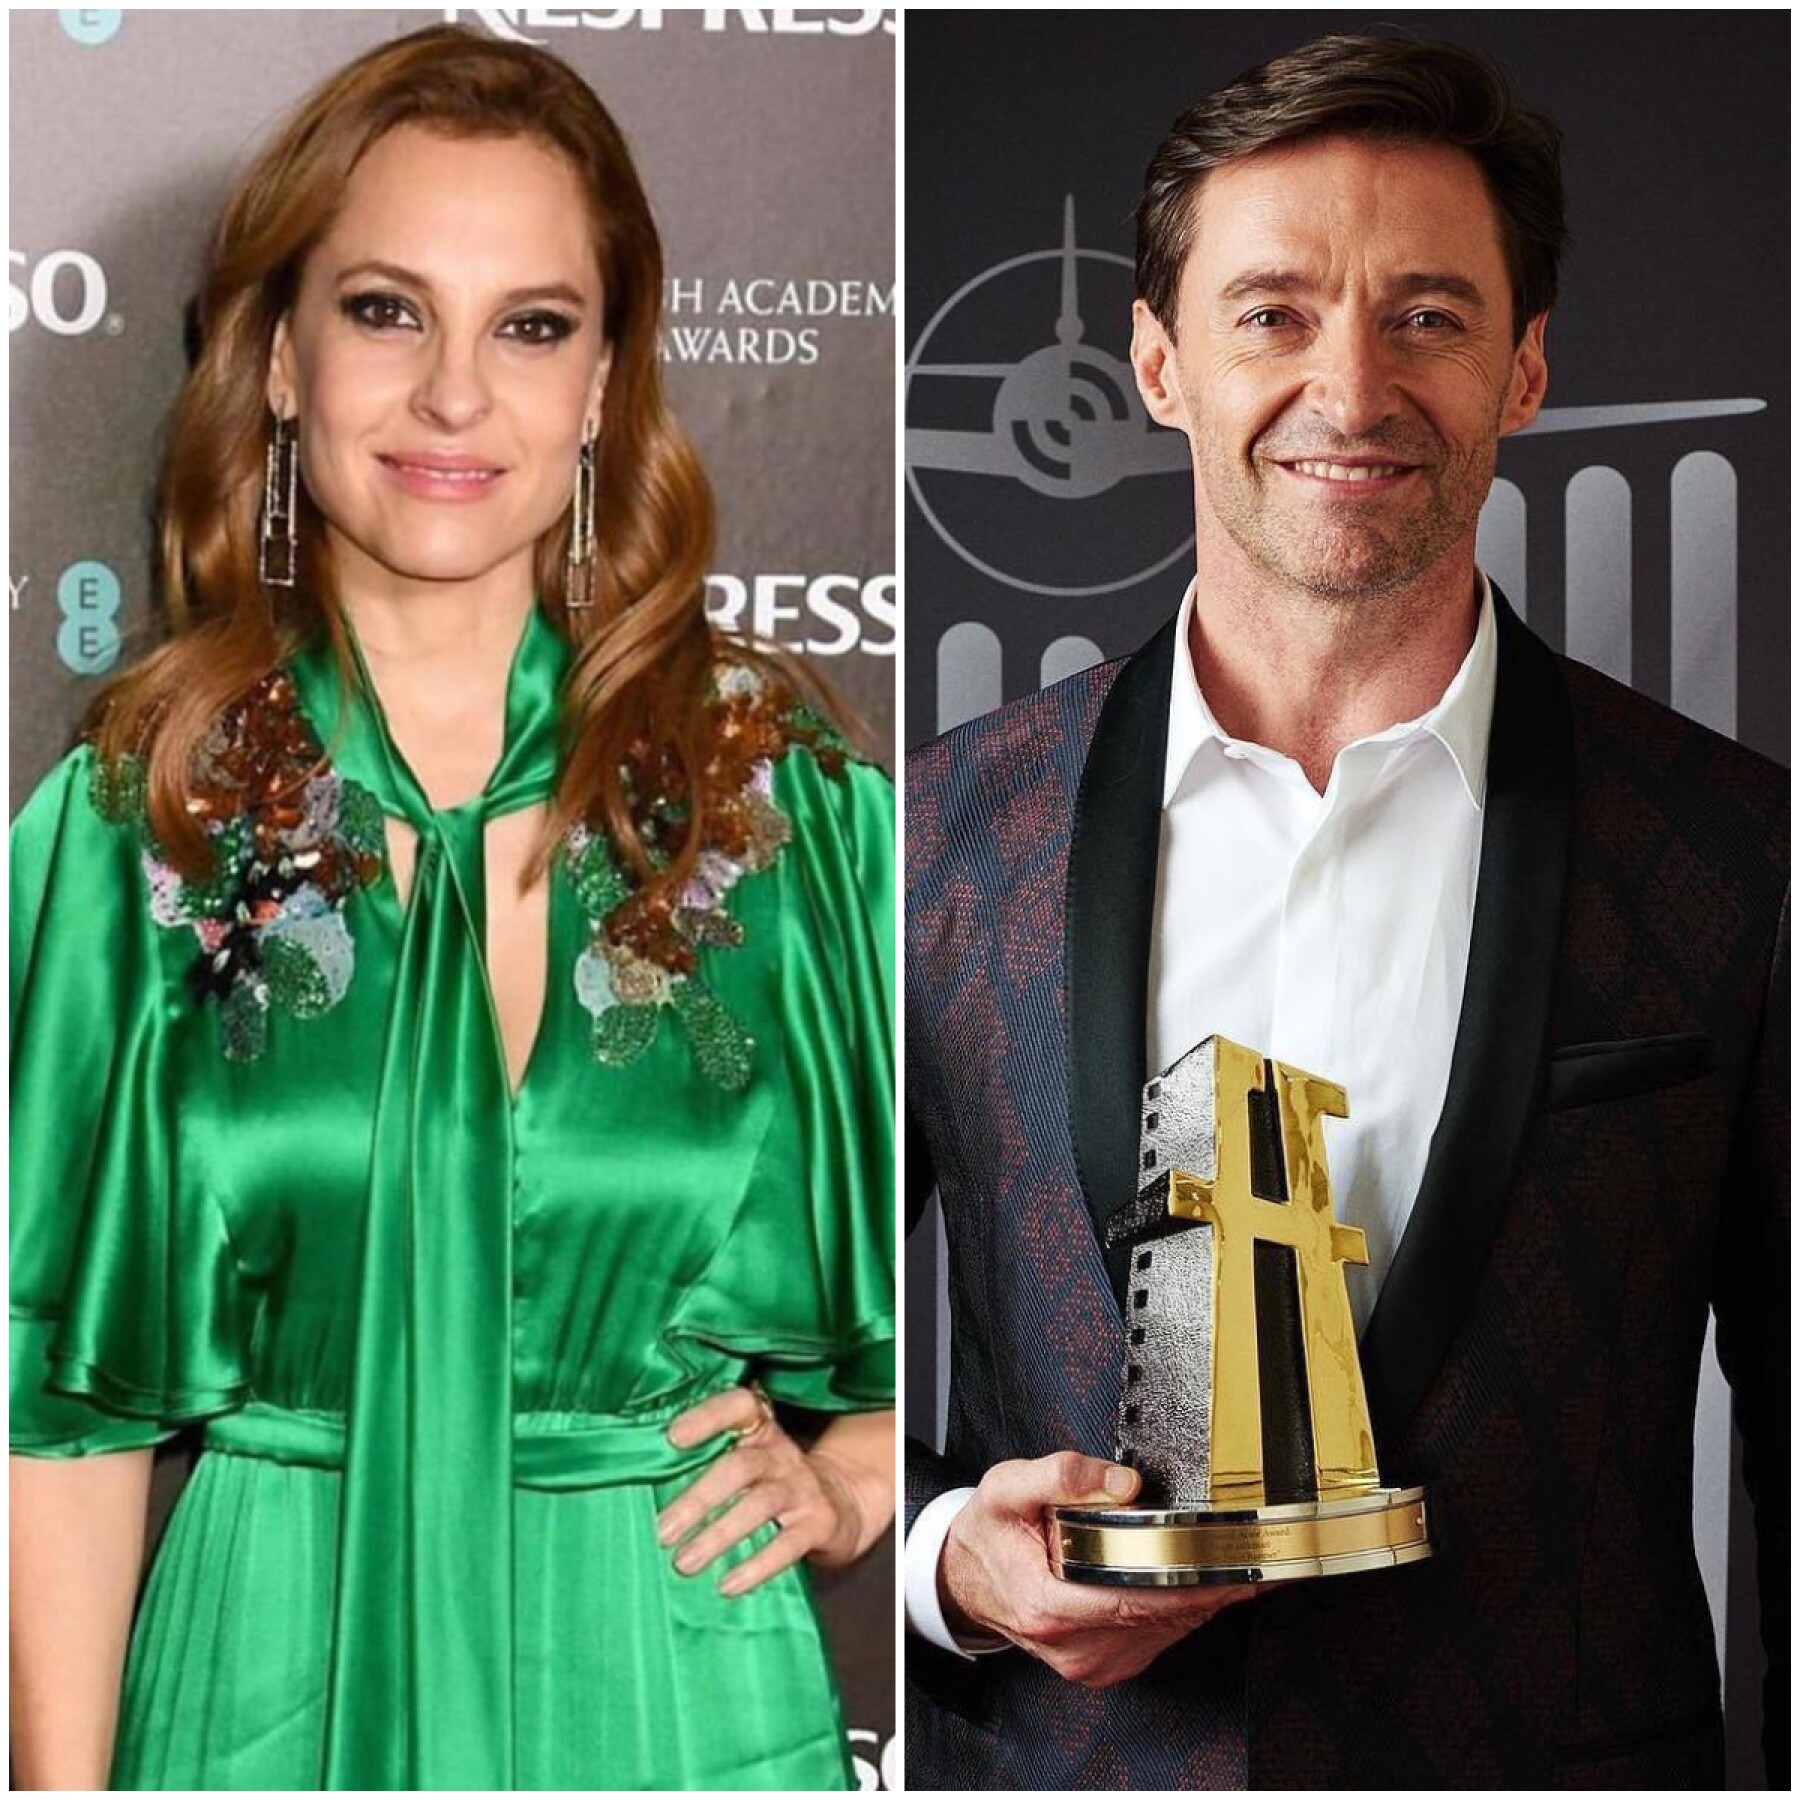 Marina de Tavira y Hugh Jackman